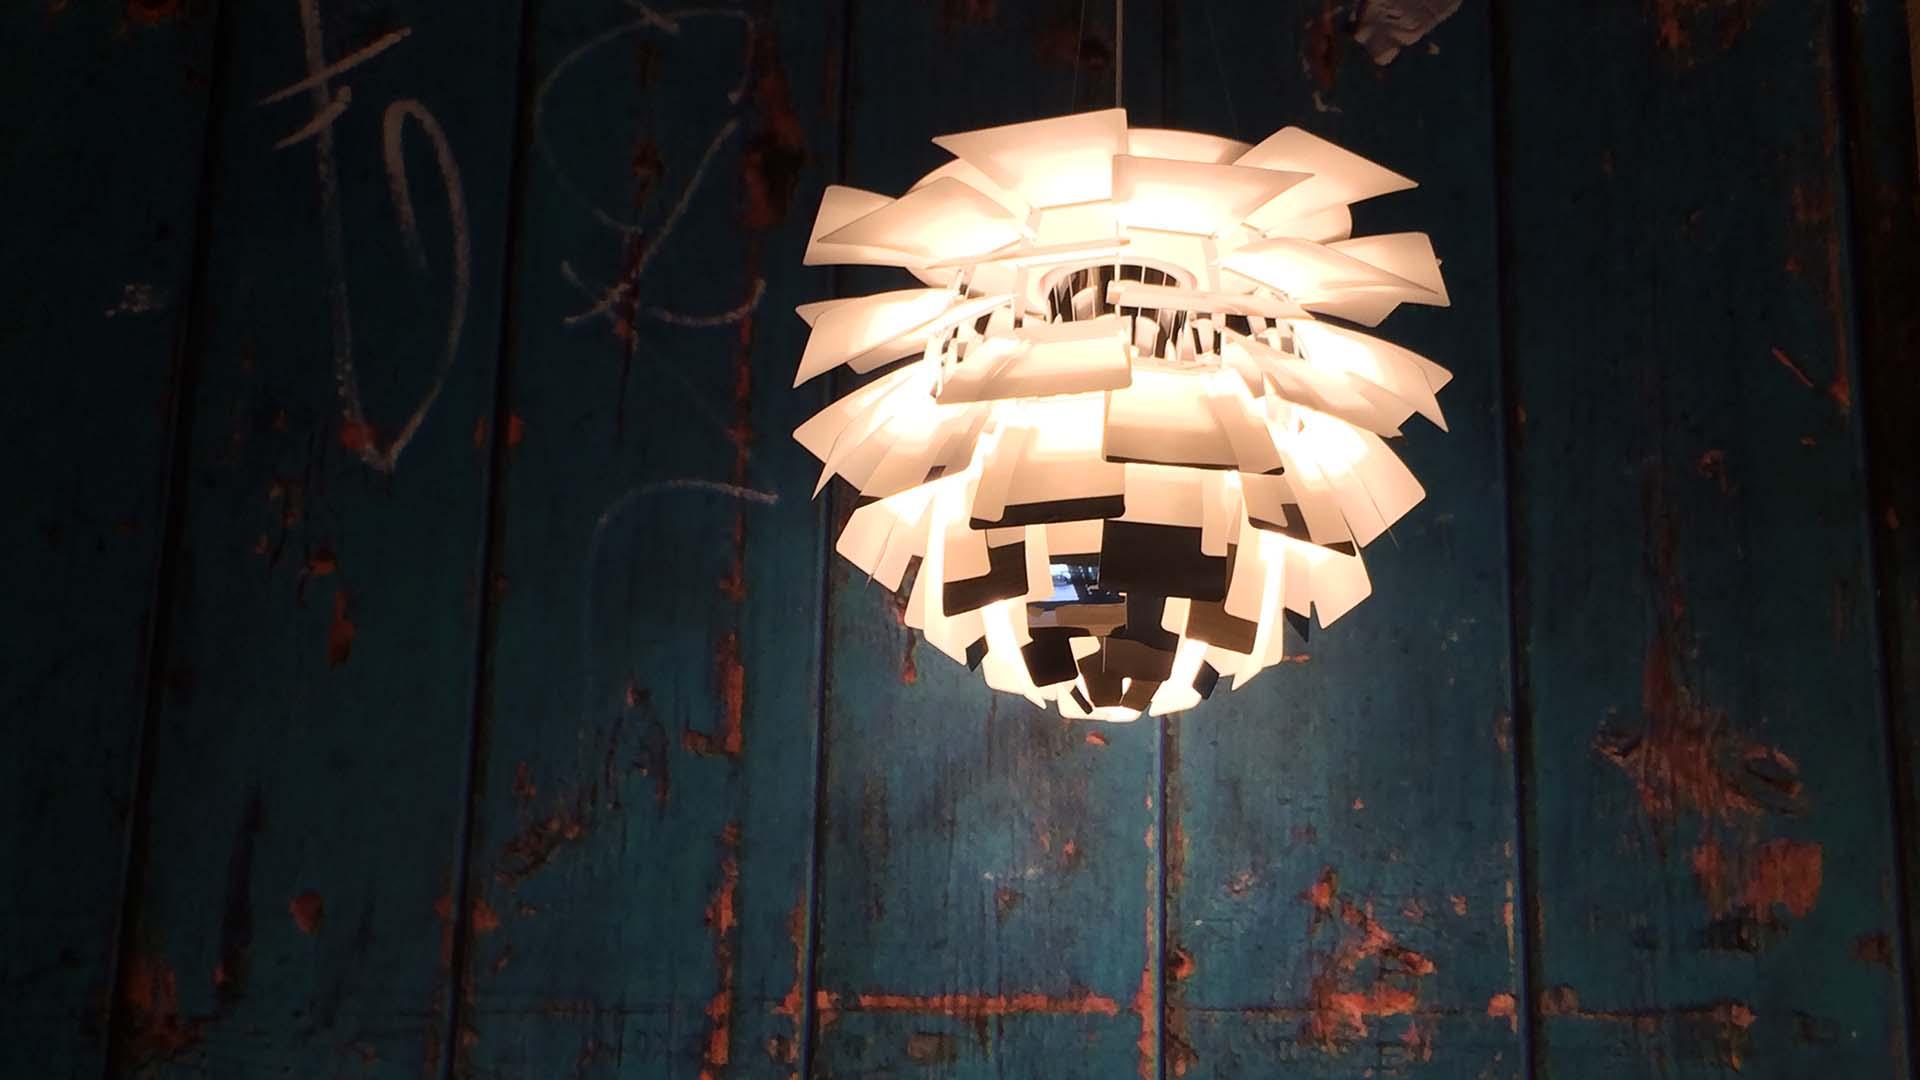 Louis Poulsen Artichoke Light + Building 2016 Review Lighting Designers Nulty